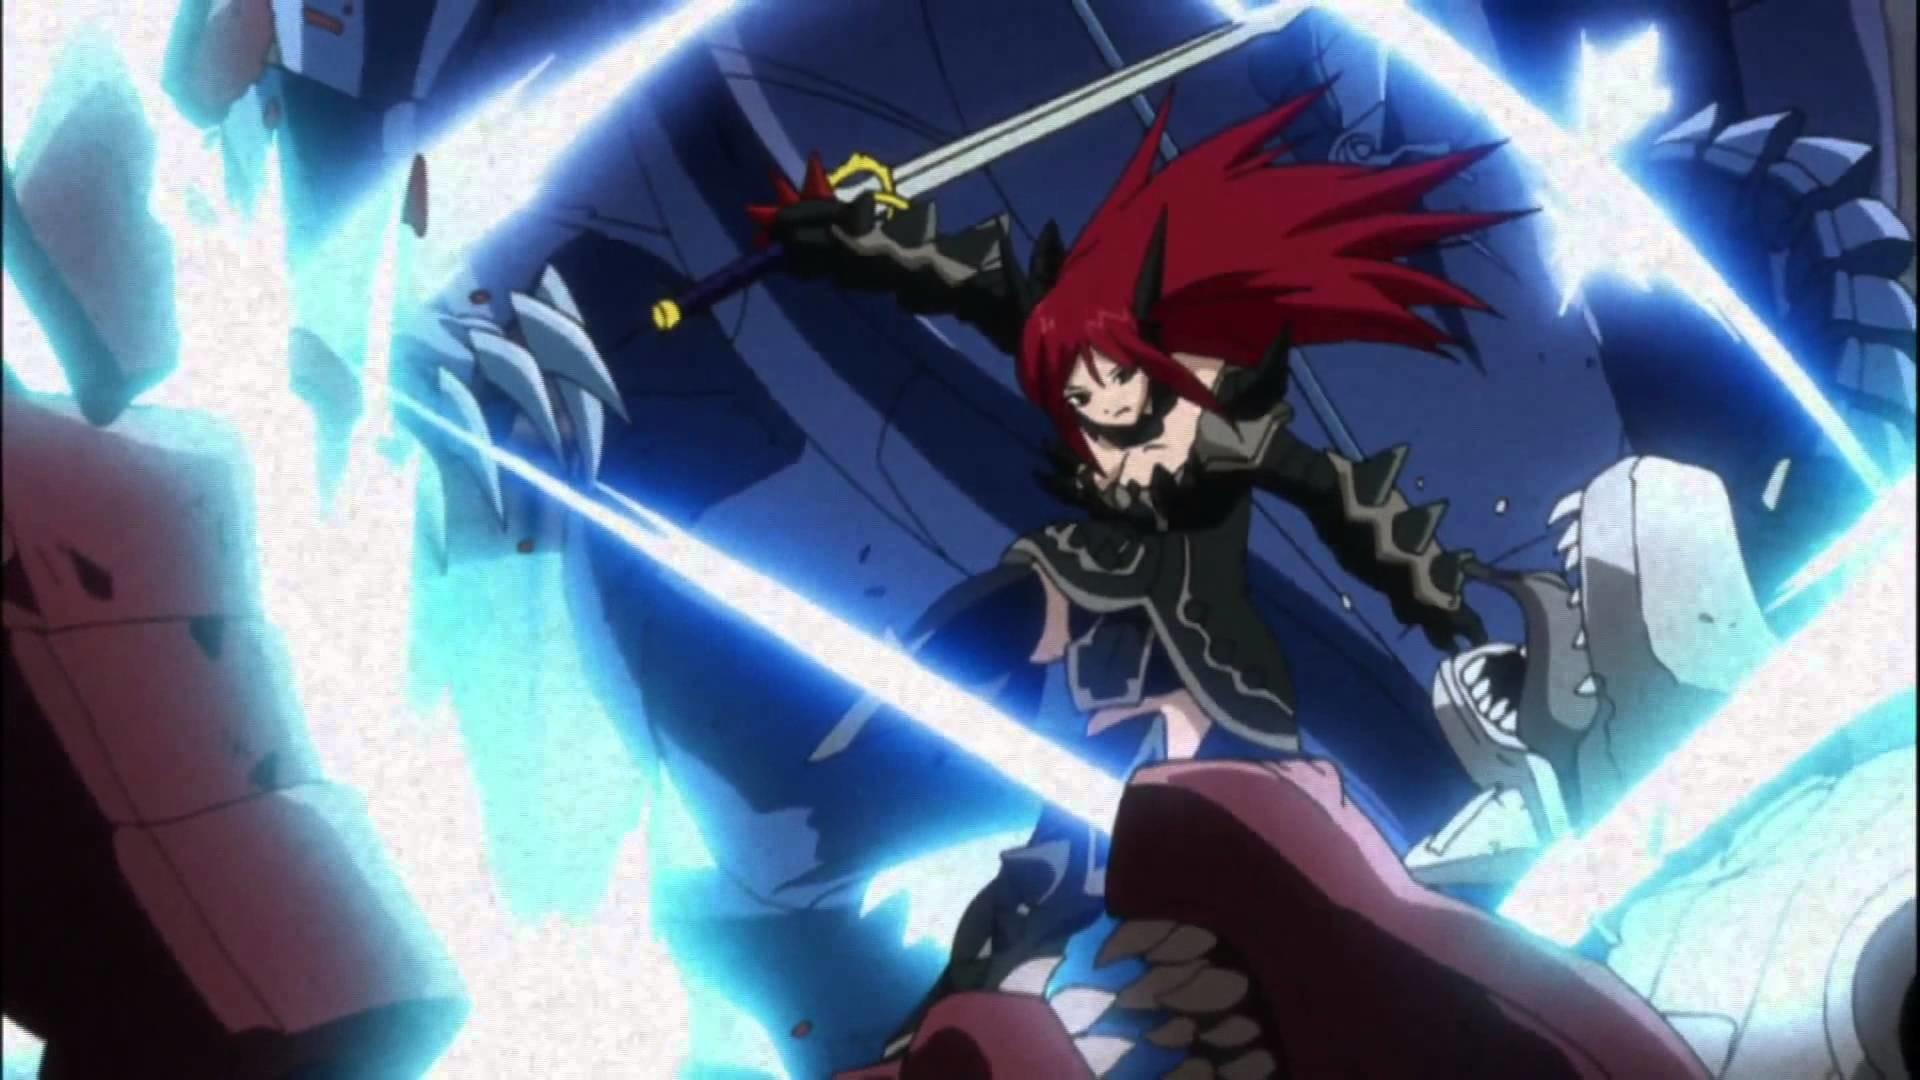 Fairy Tail AMV – Erza Scarlet (HD)